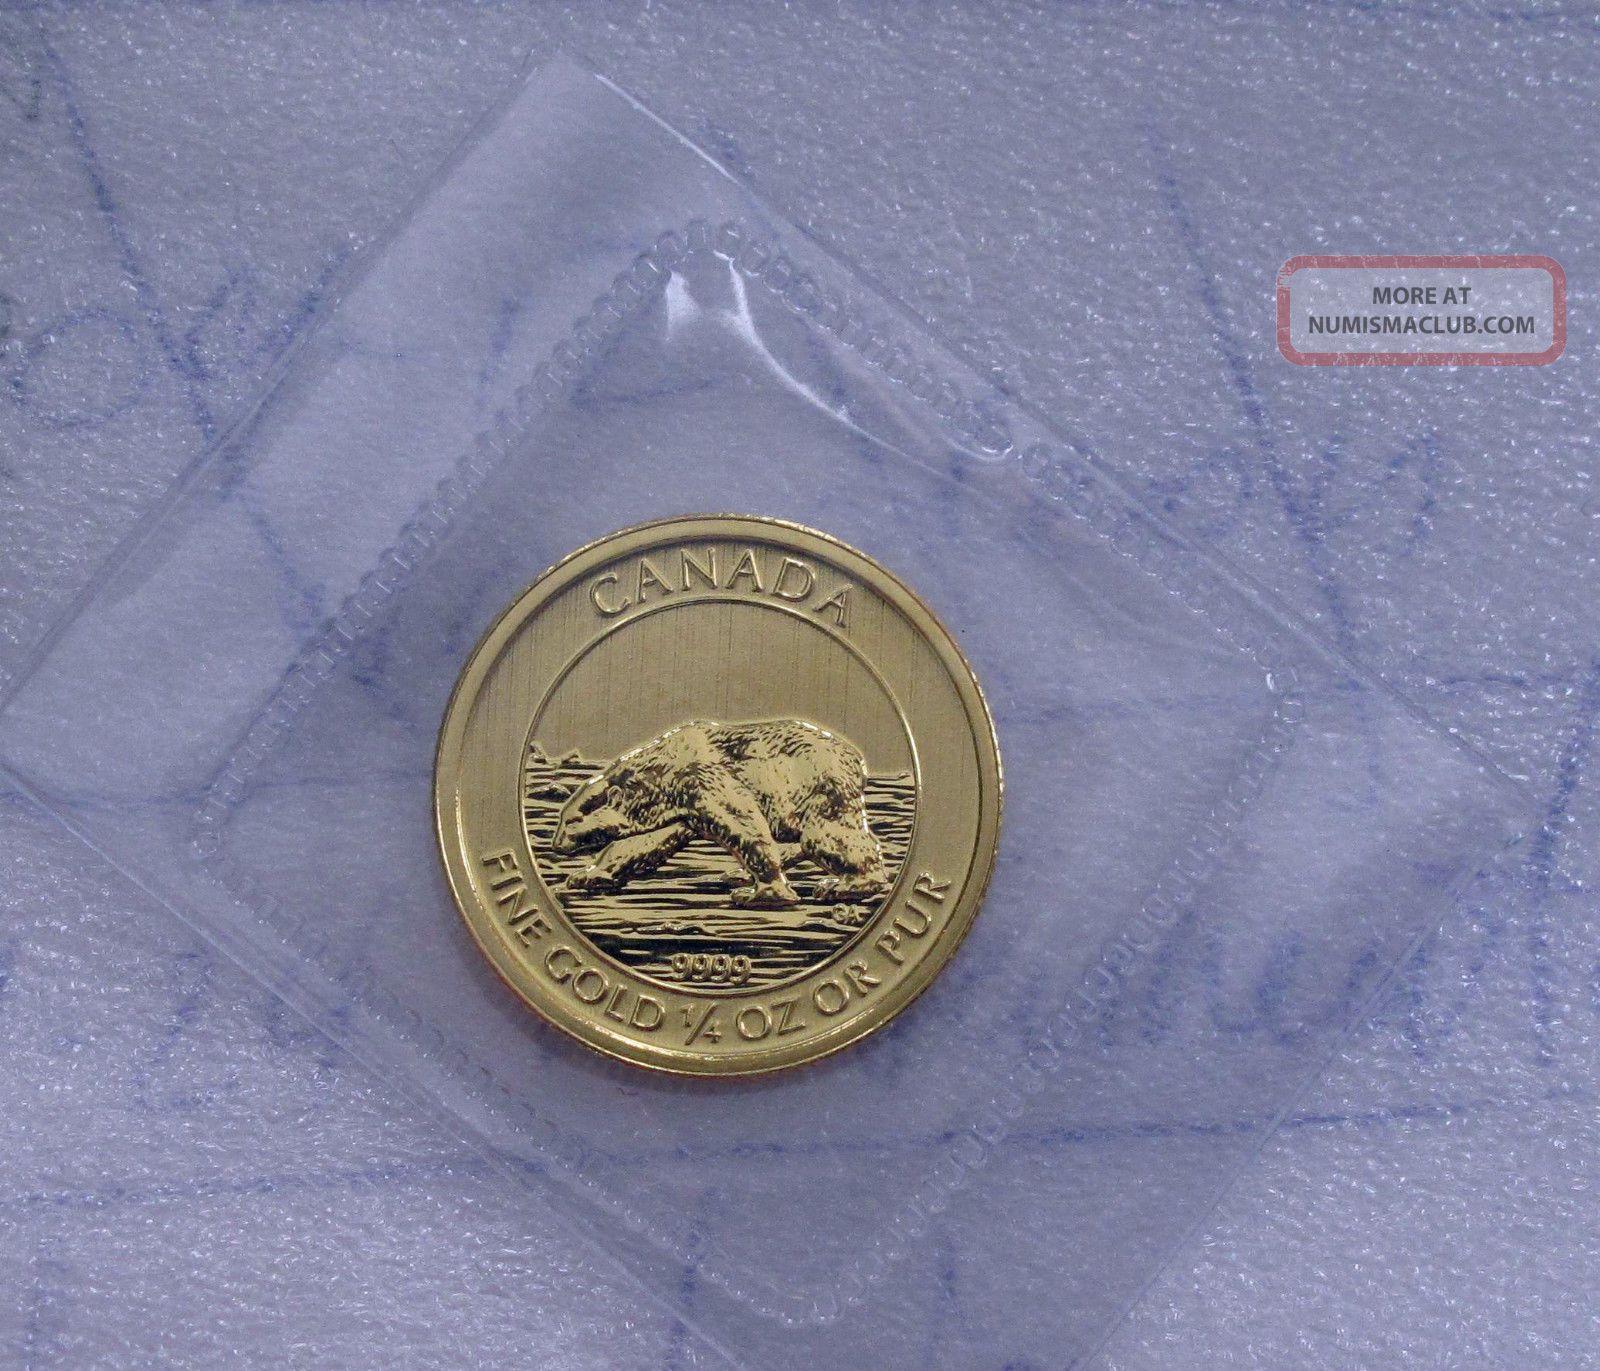 2013 Canada 1 4 Oz 9999 Gold 10 Dollars Coin Polar